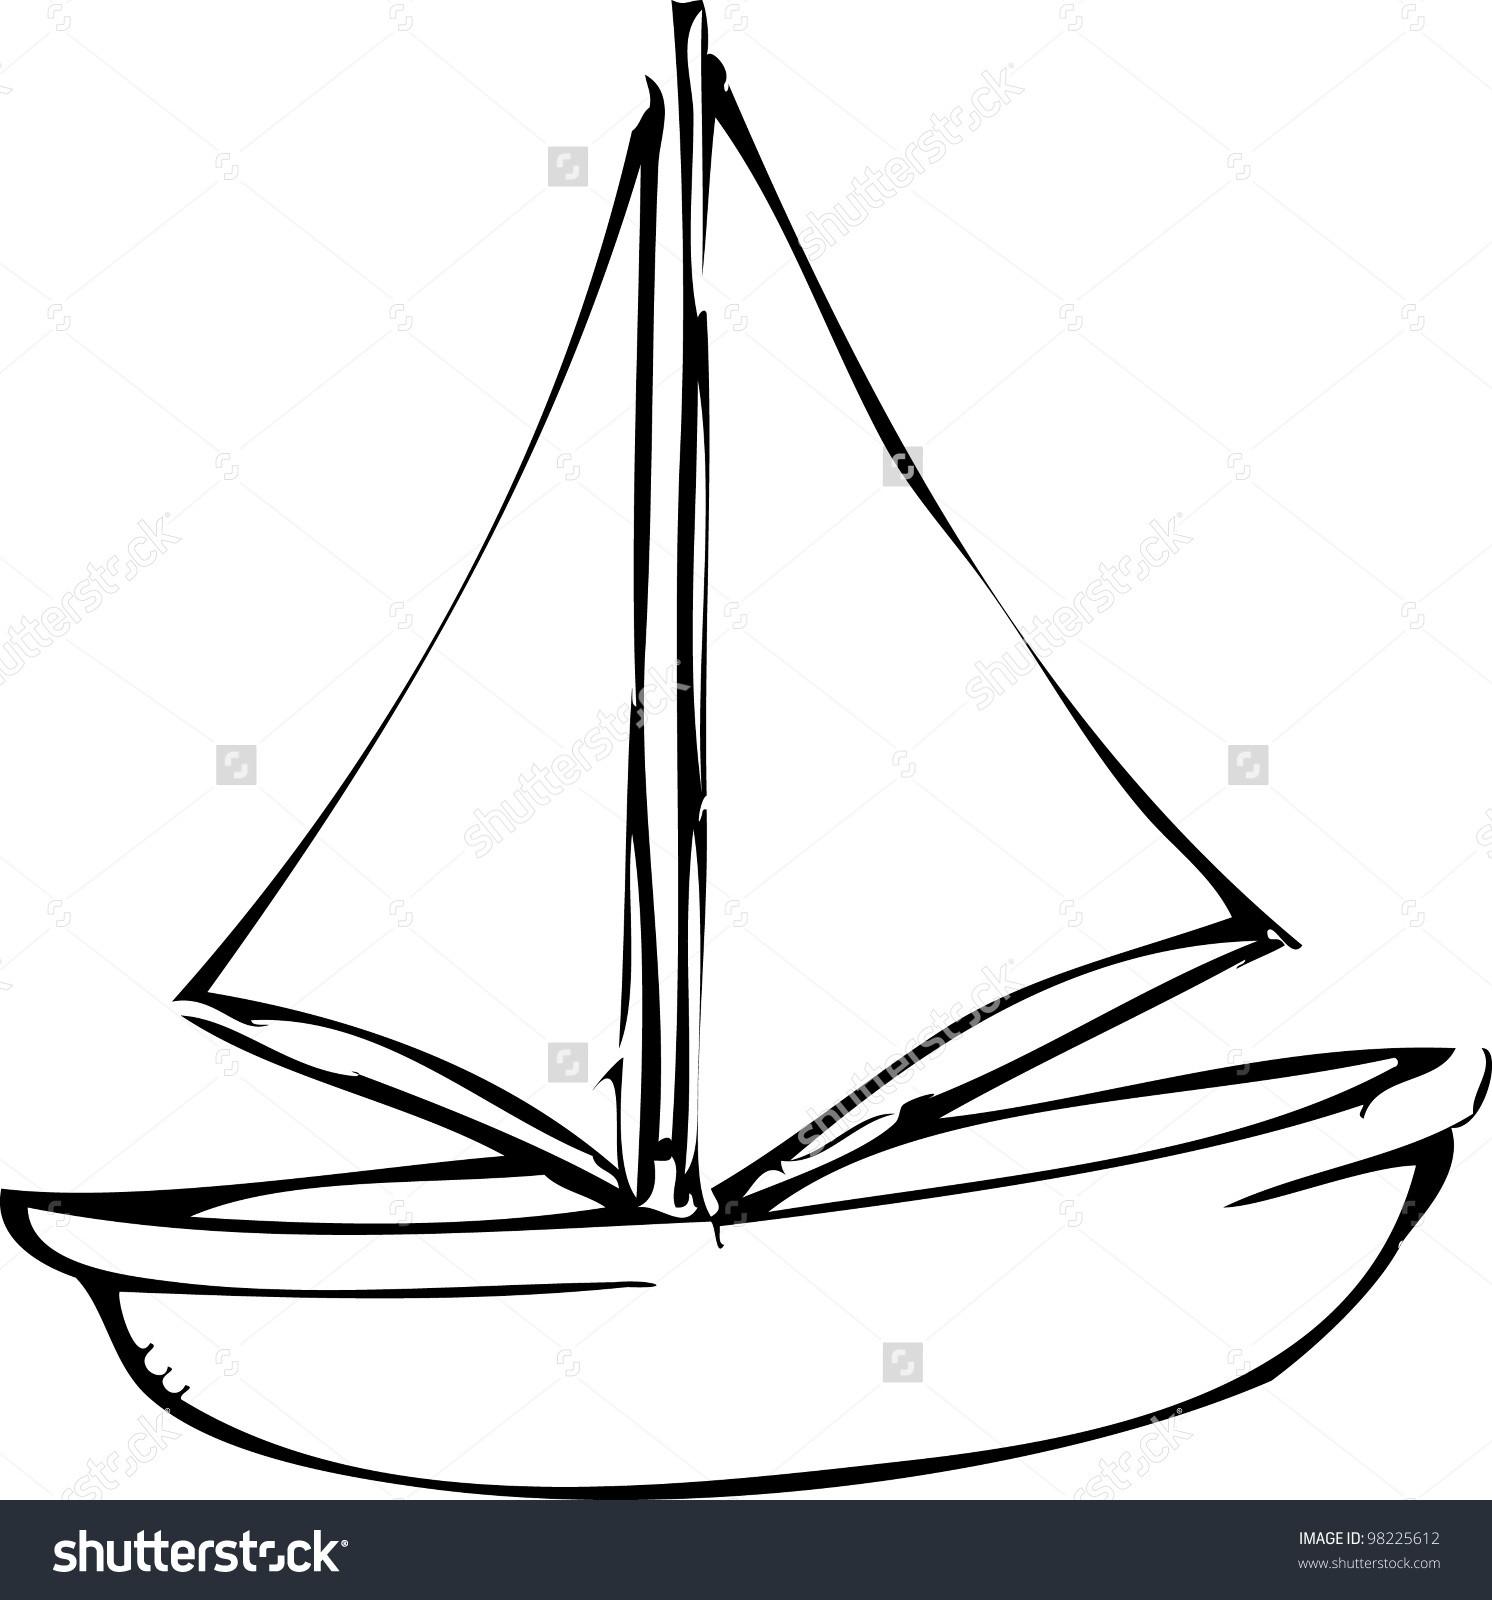 1492x1600 boat drawing save boat drawing simple drawing boat drawing sketch